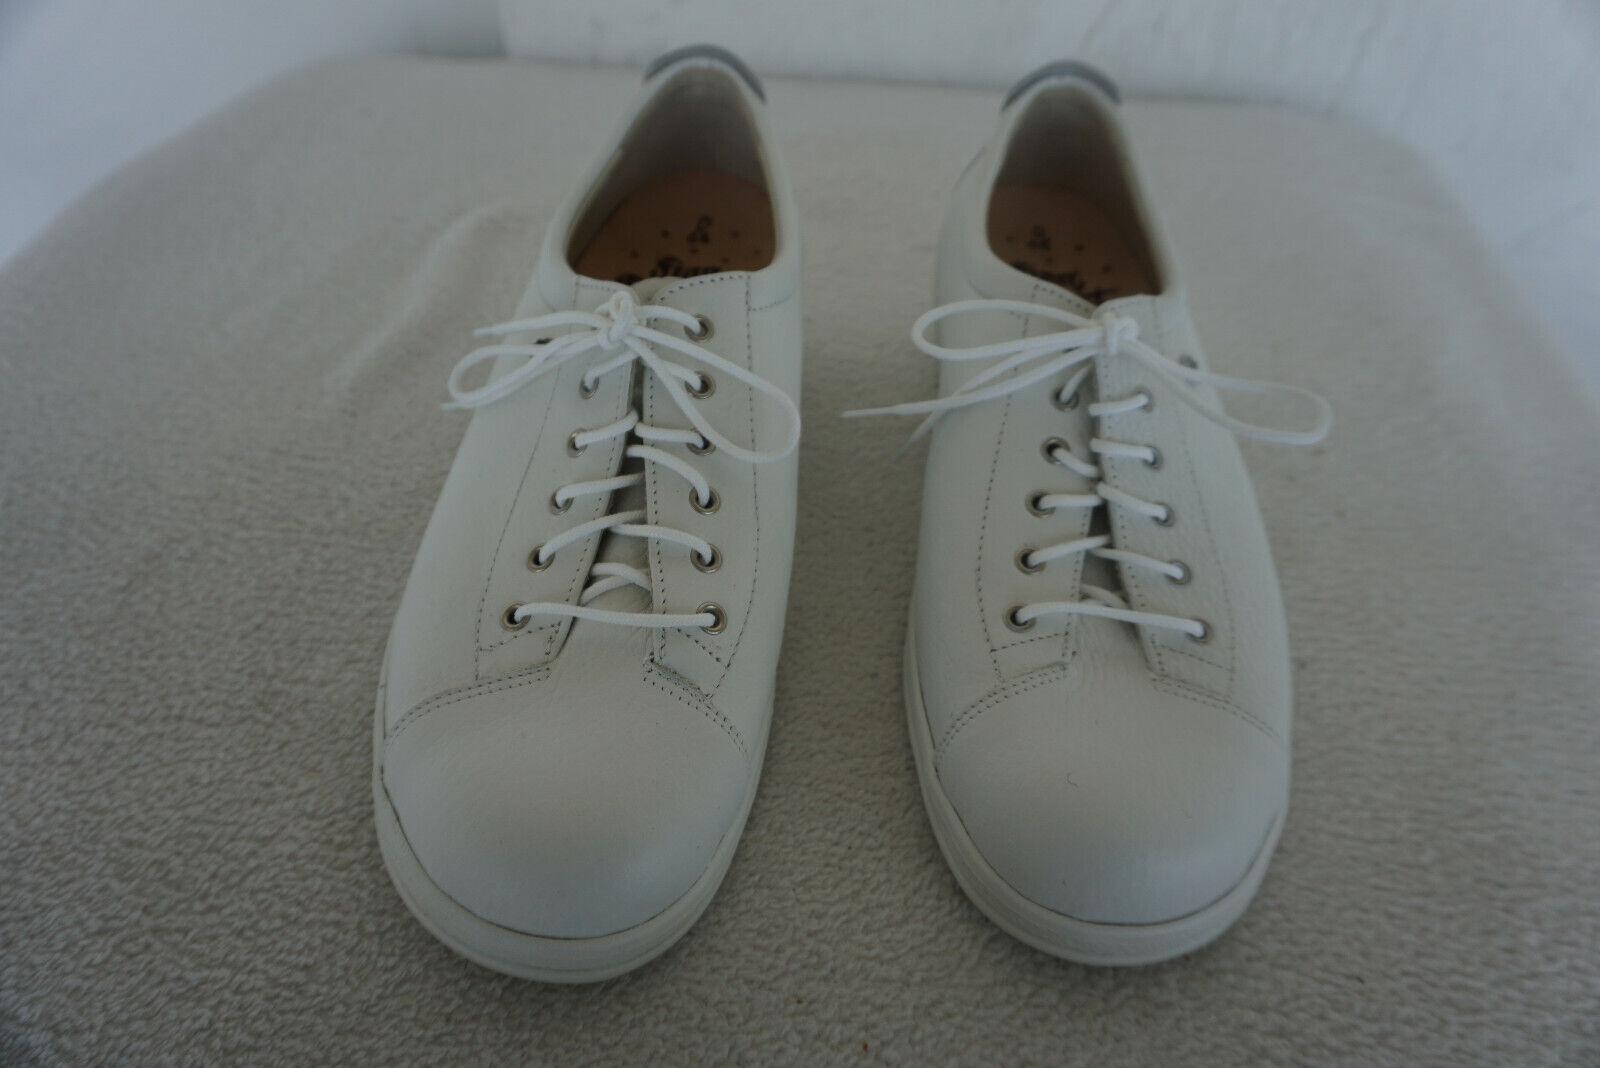 FINN COMFORT EMS Chaussures Femmes Chaussure Lacée M dépôts taille 6,5 40 en cuir blanc NEUF